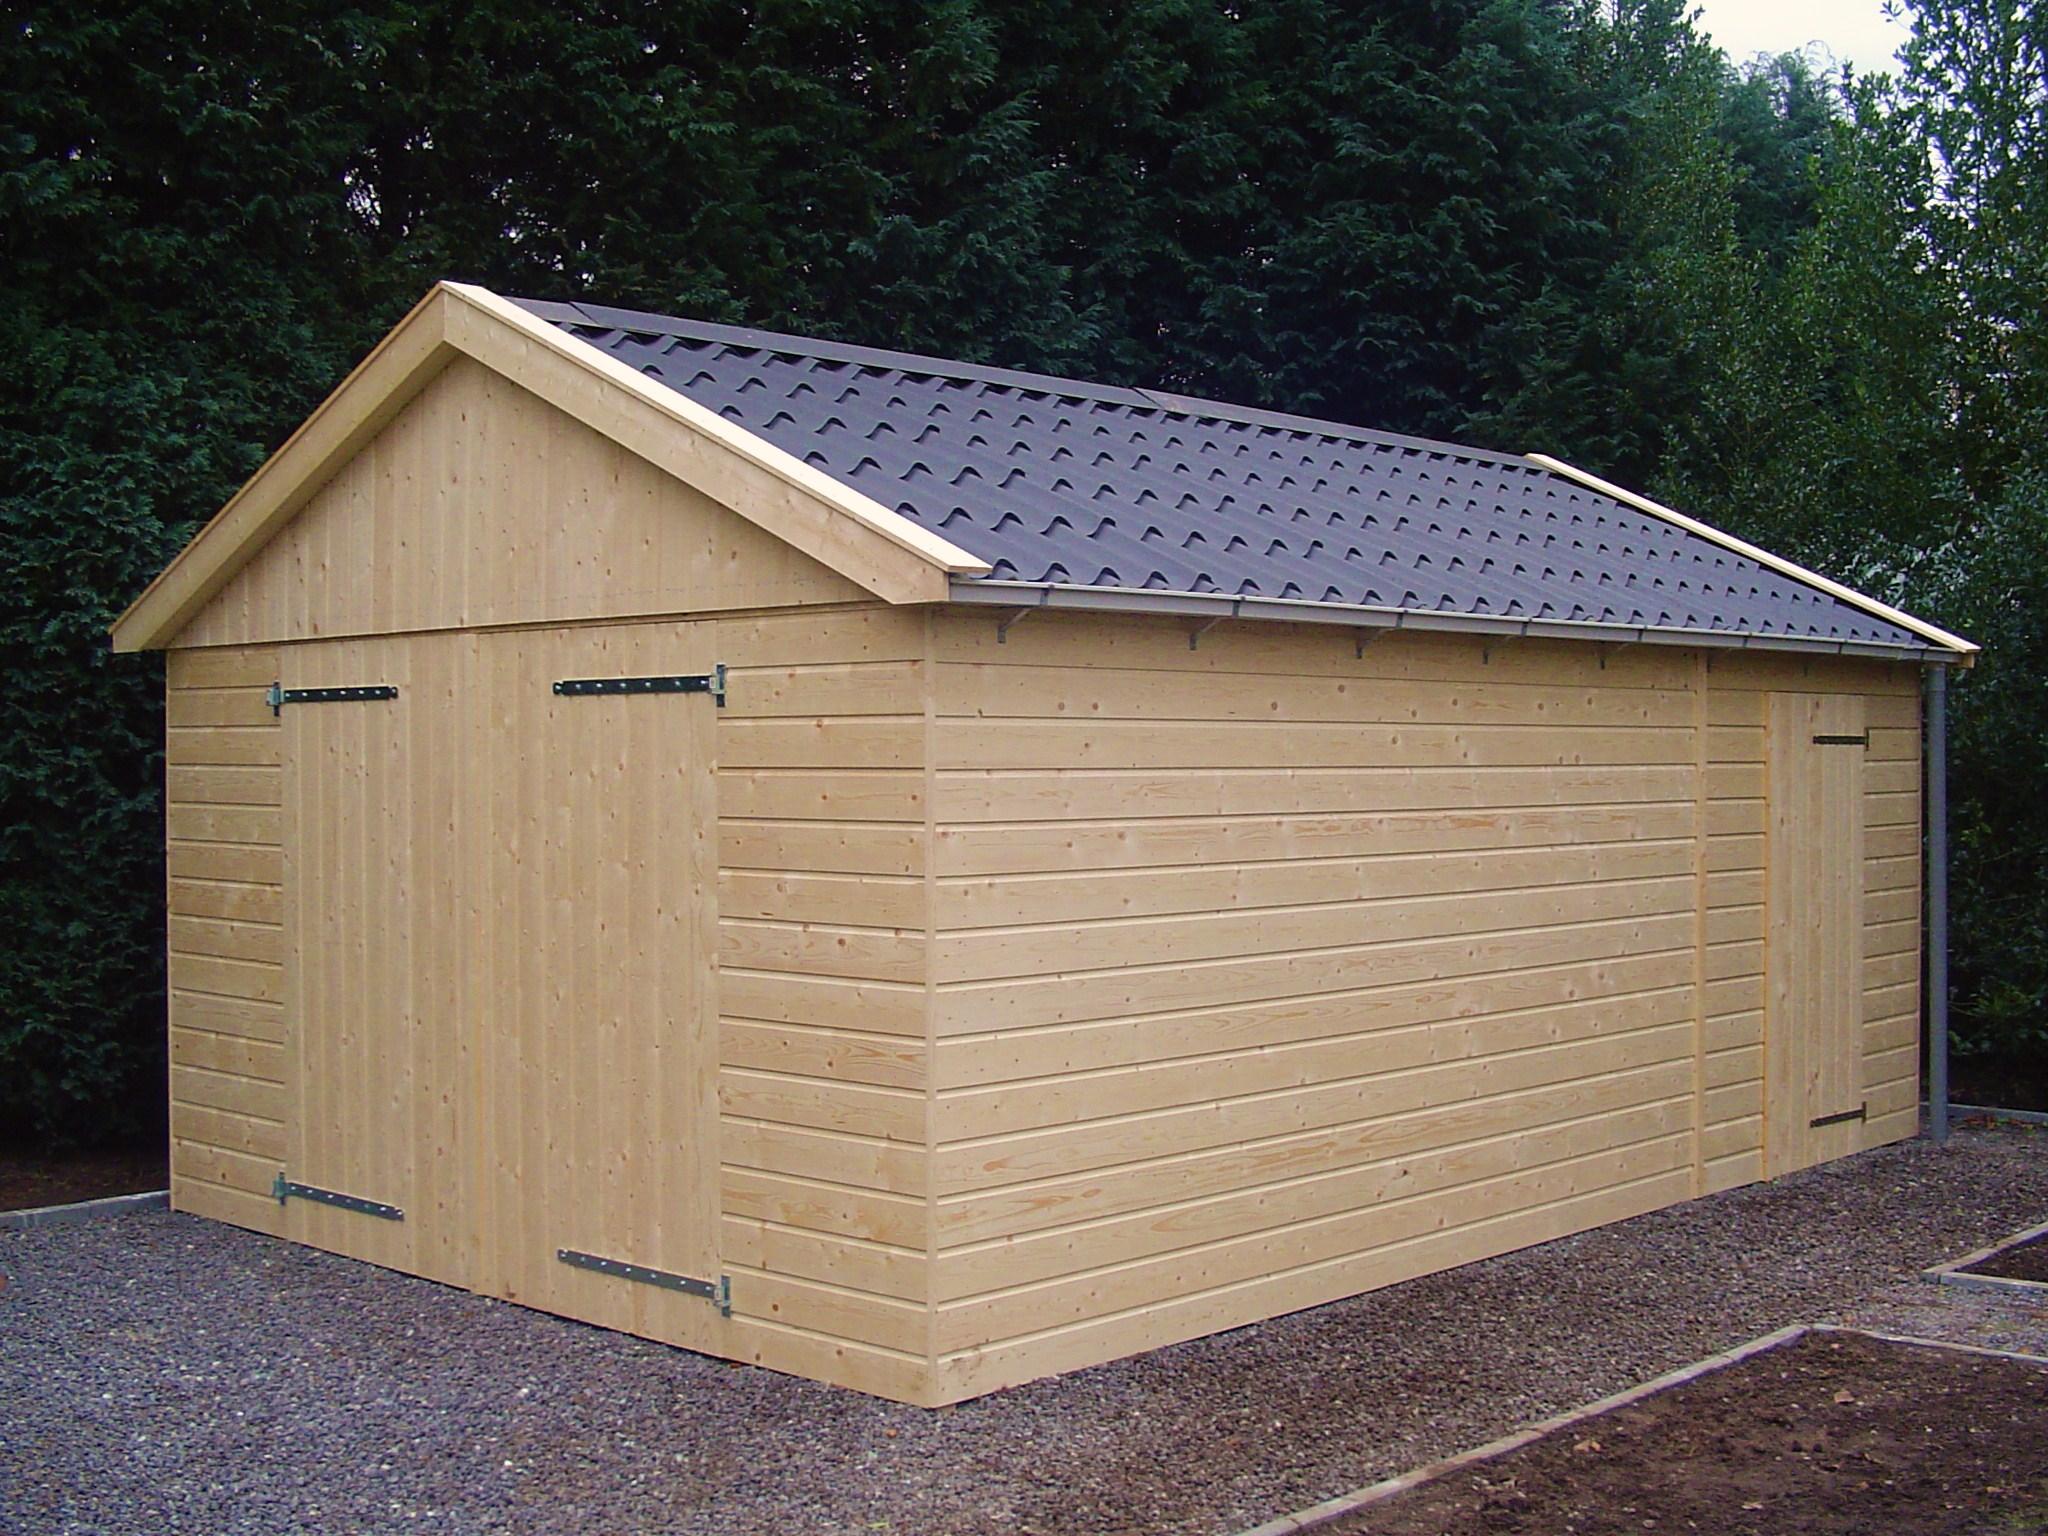 Goedkope houten garage - Goedkopeschuur.nl